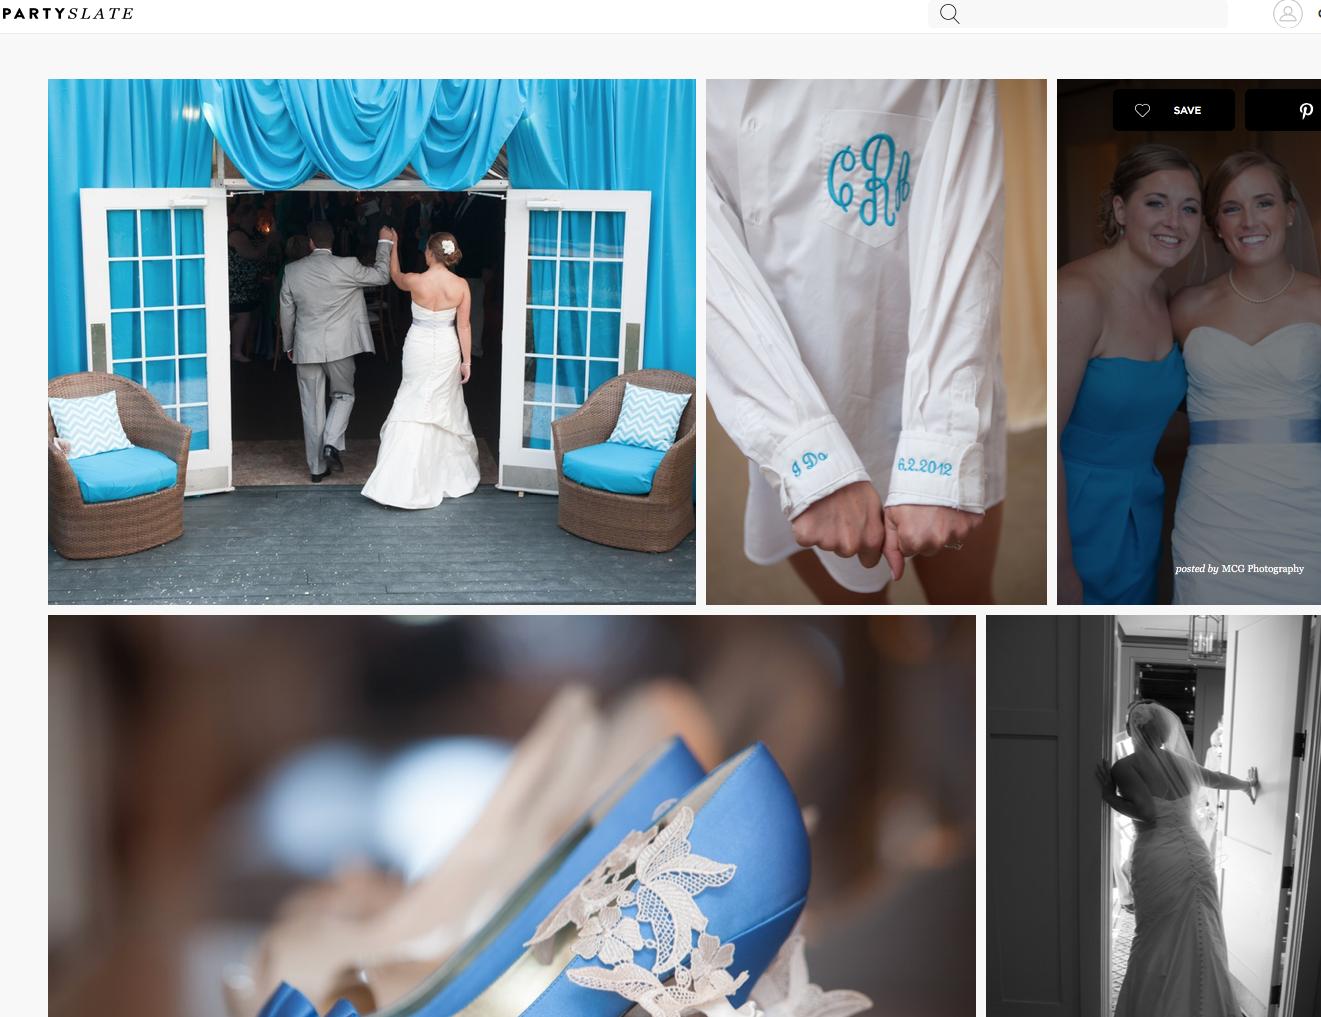 PartySlate_Kiawah_Island_wedding.png